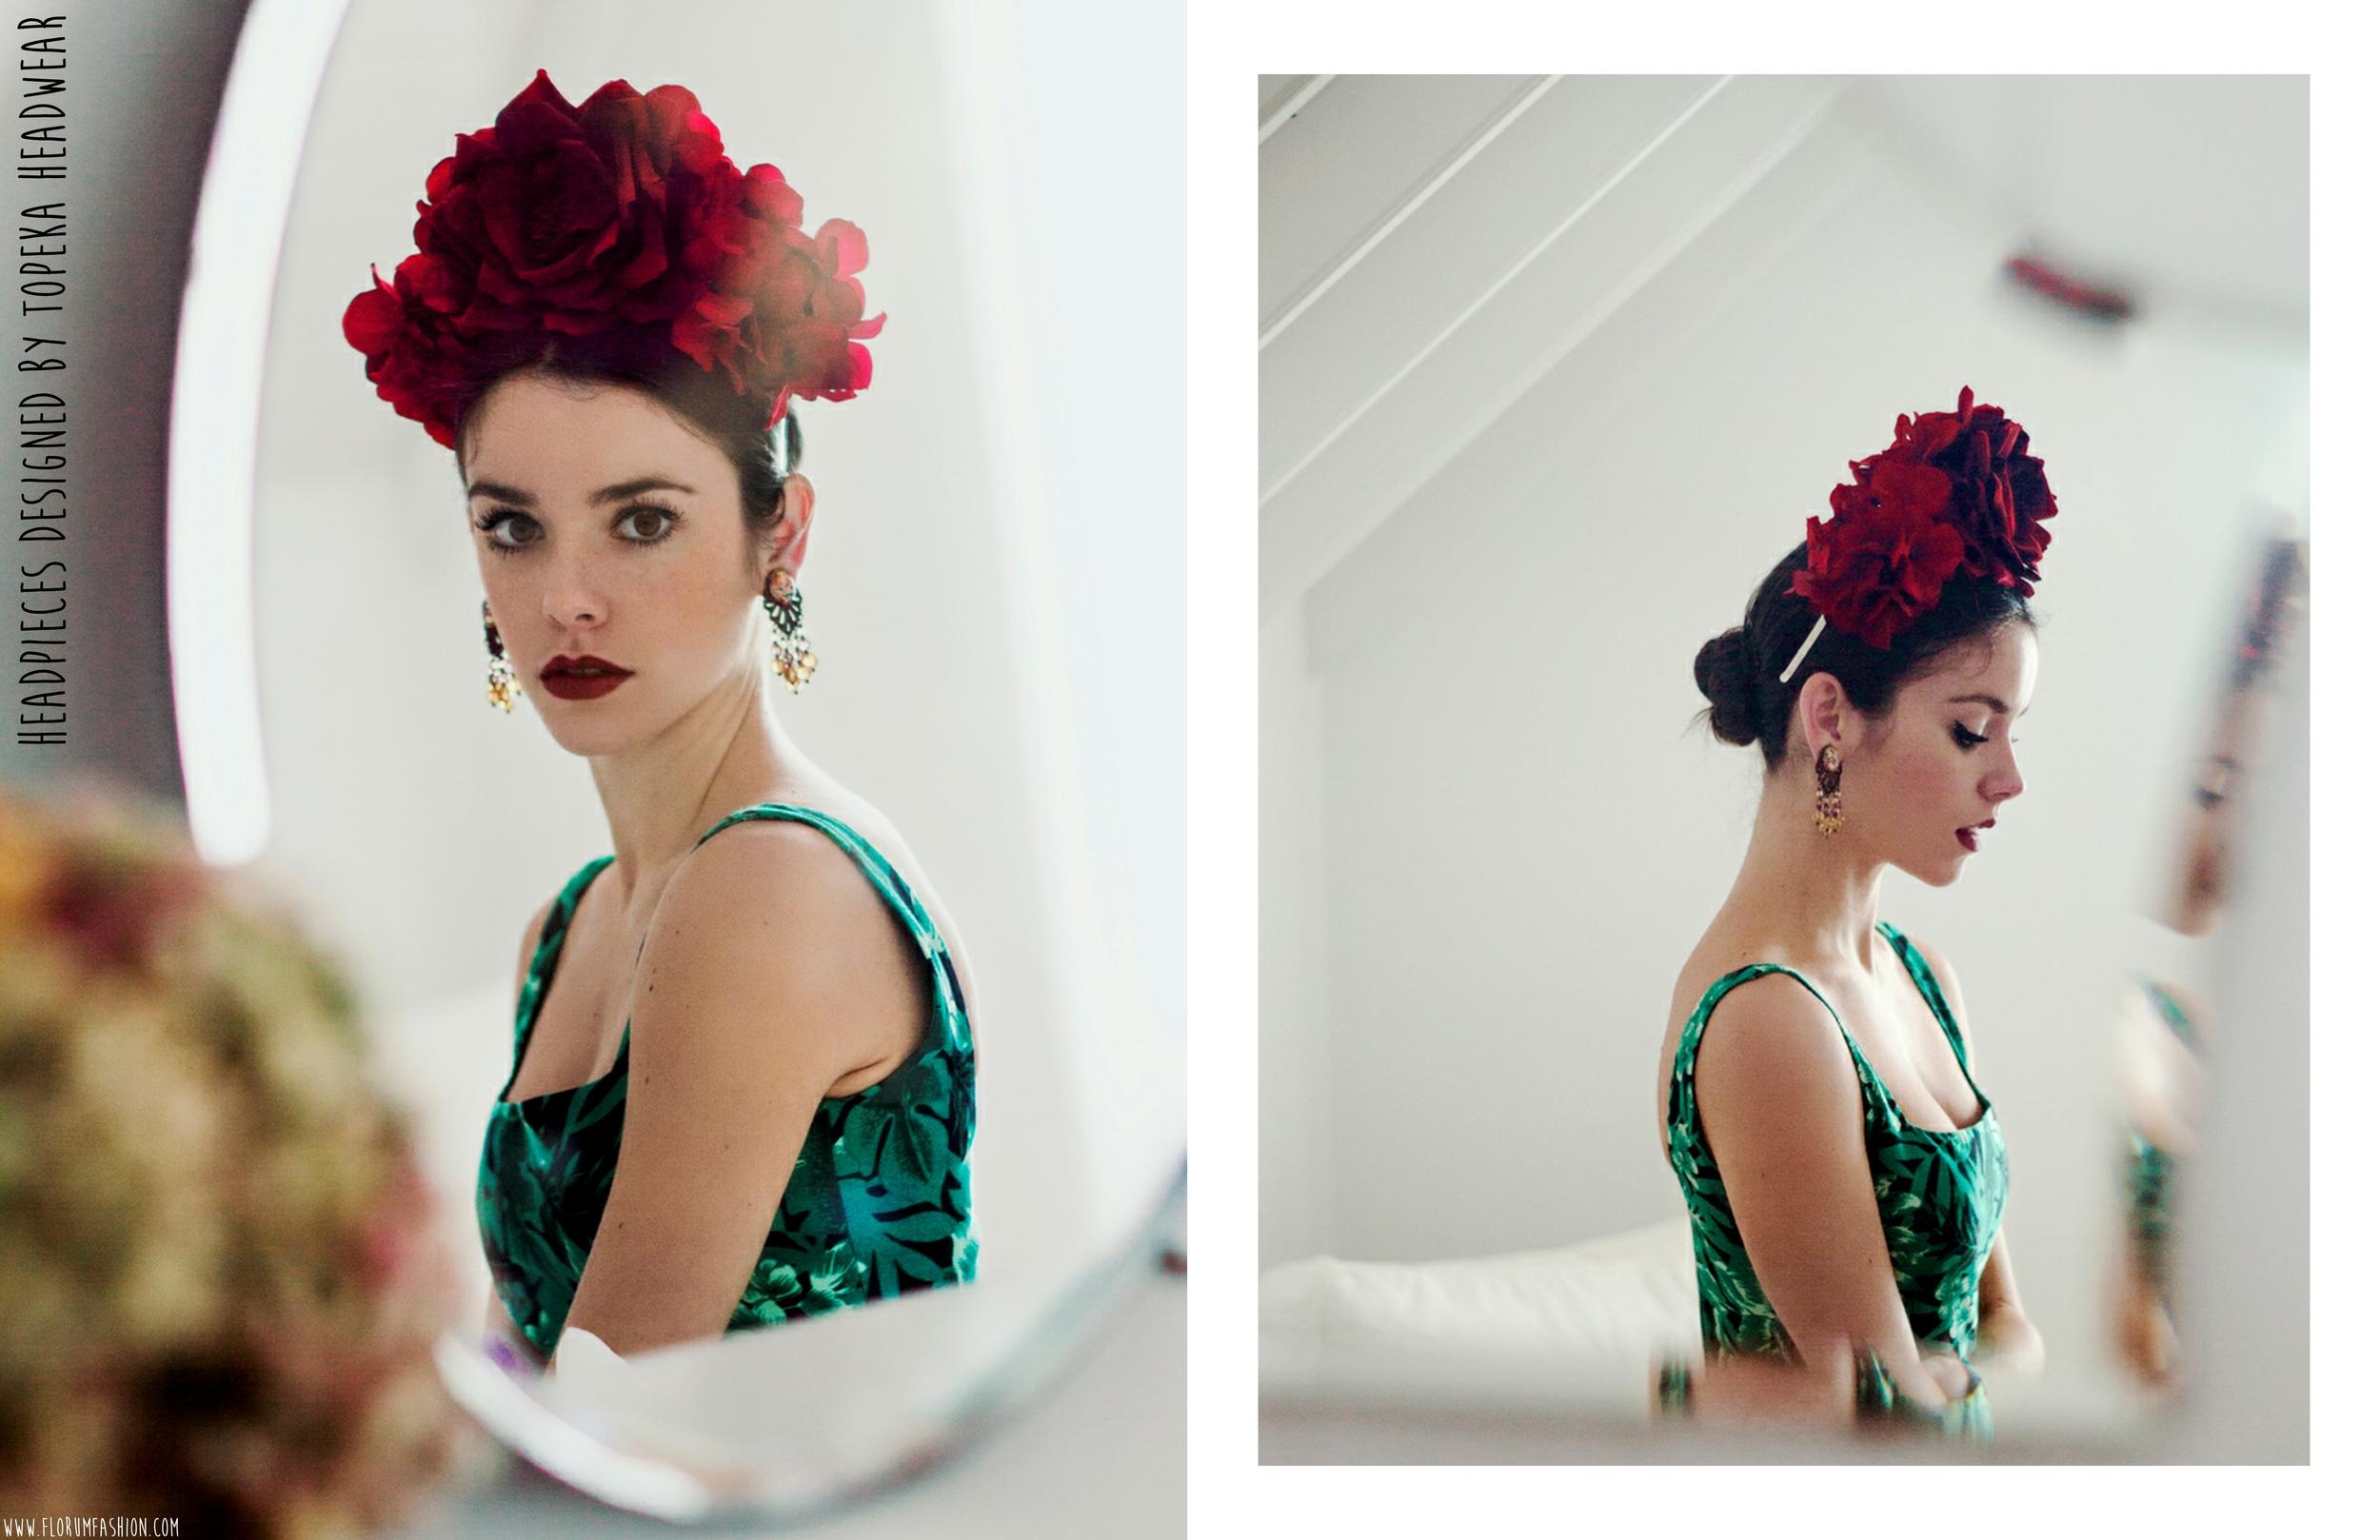 Topeka Headwear - Joaquin Burgueño - Ballerina Sofia Rubio Robles - Carlota Cabrera Ballesteros - Florum Magazine - Fashion Revolution - Slow Movement - Ethical -Sustainable - Canary Islands Spain -04